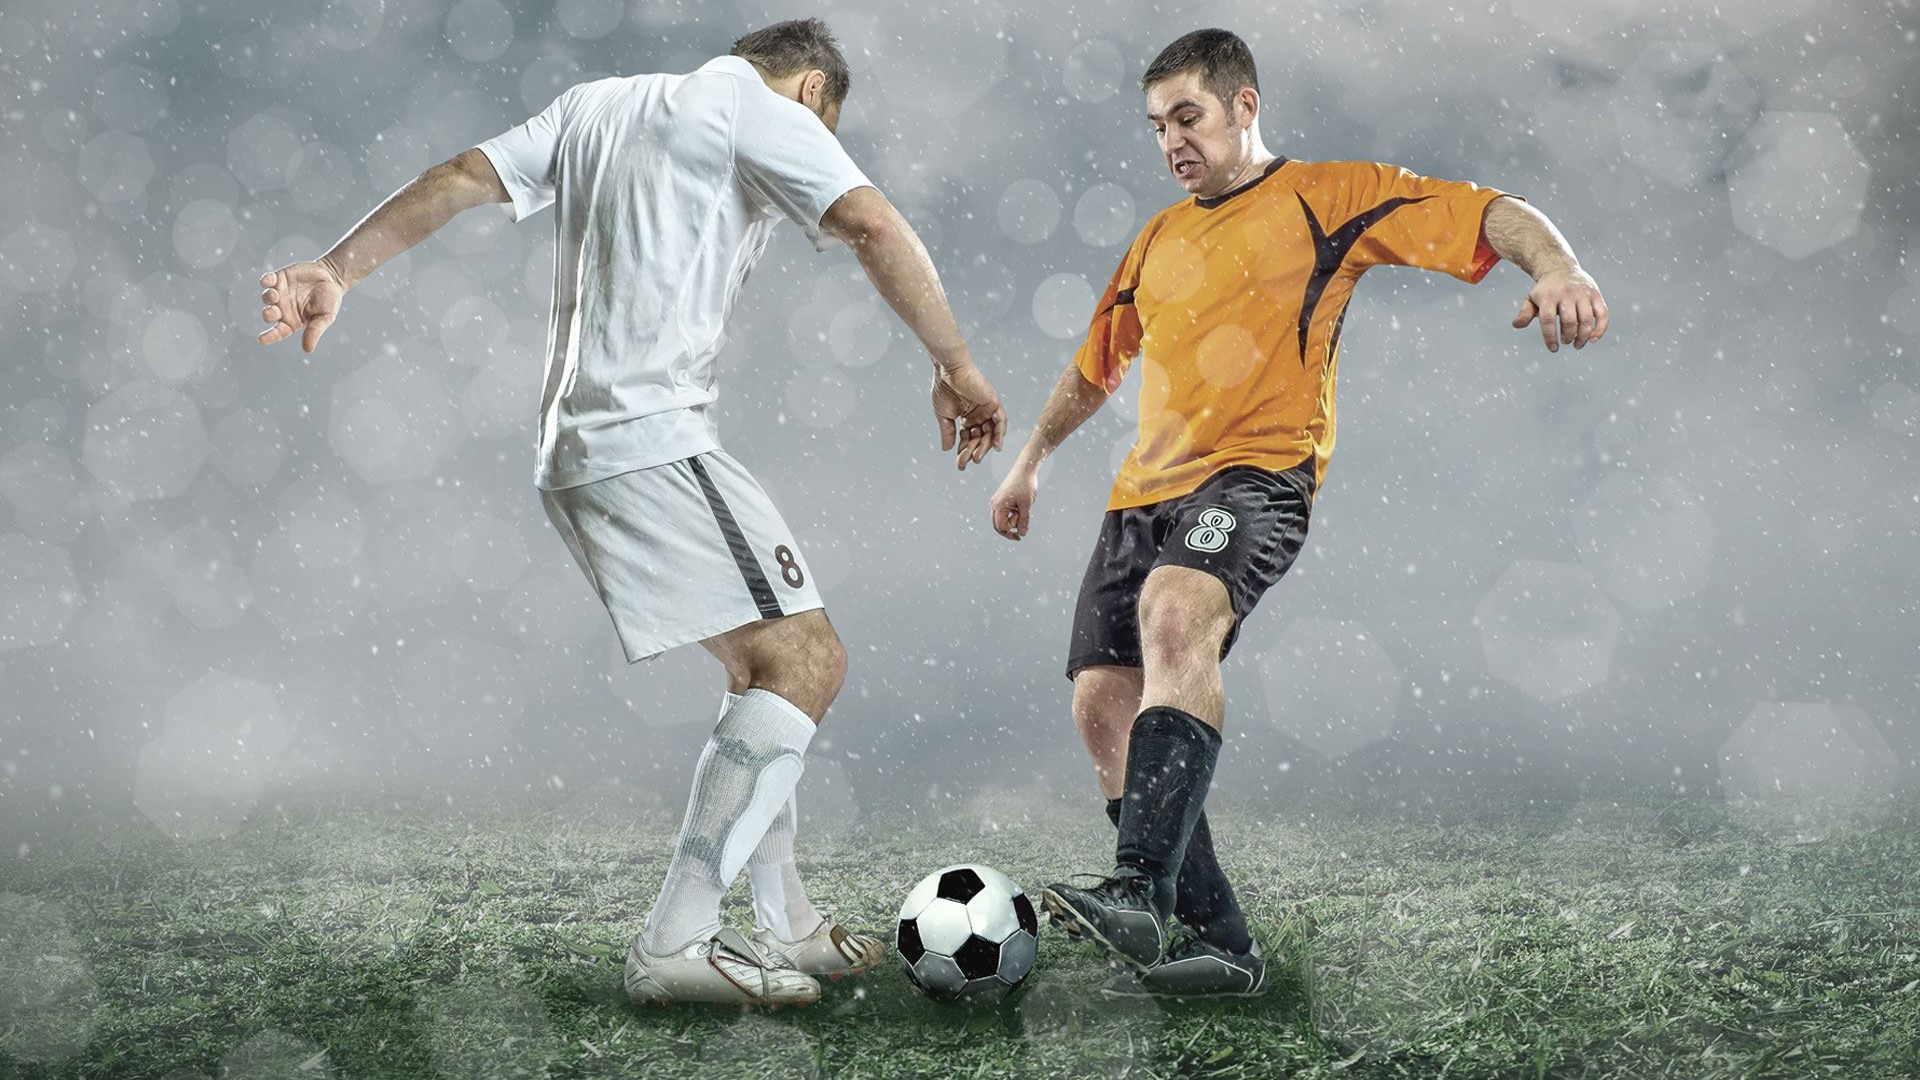 stade-francais-vs-ospreys-rugby-stream-live